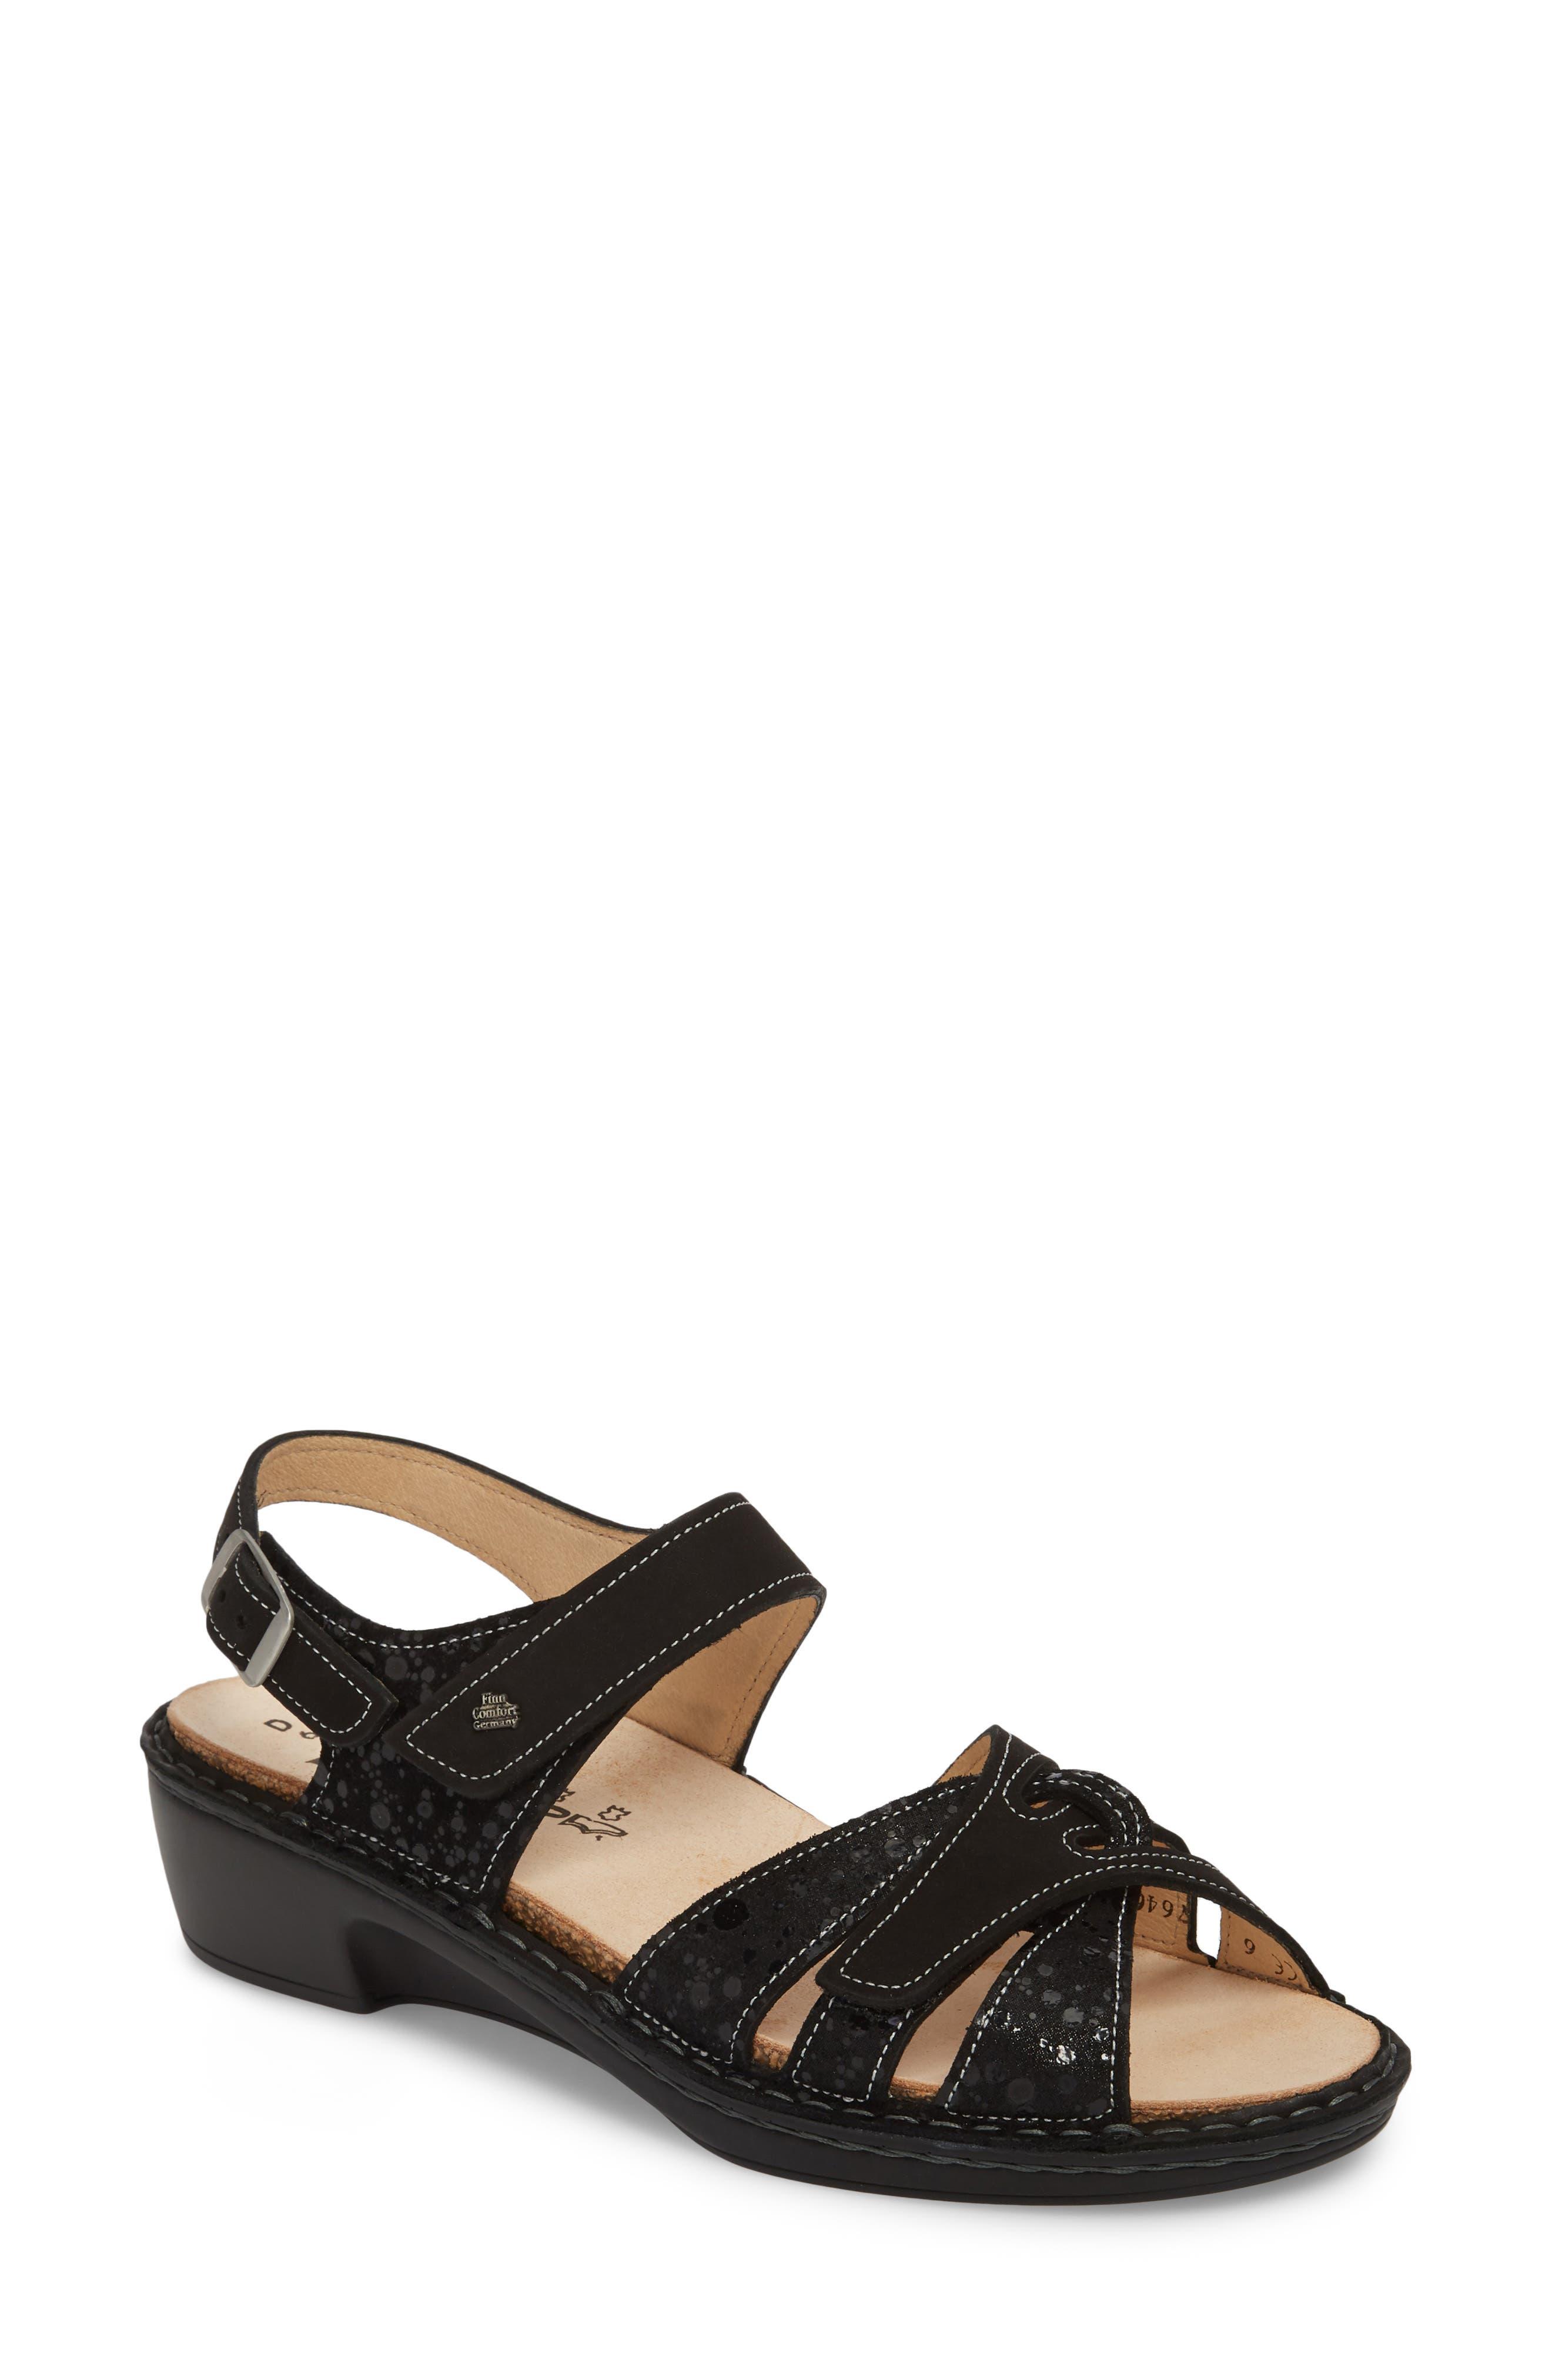 FINN COMFORT, Buka Sandal, Main thumbnail 1, color, 001